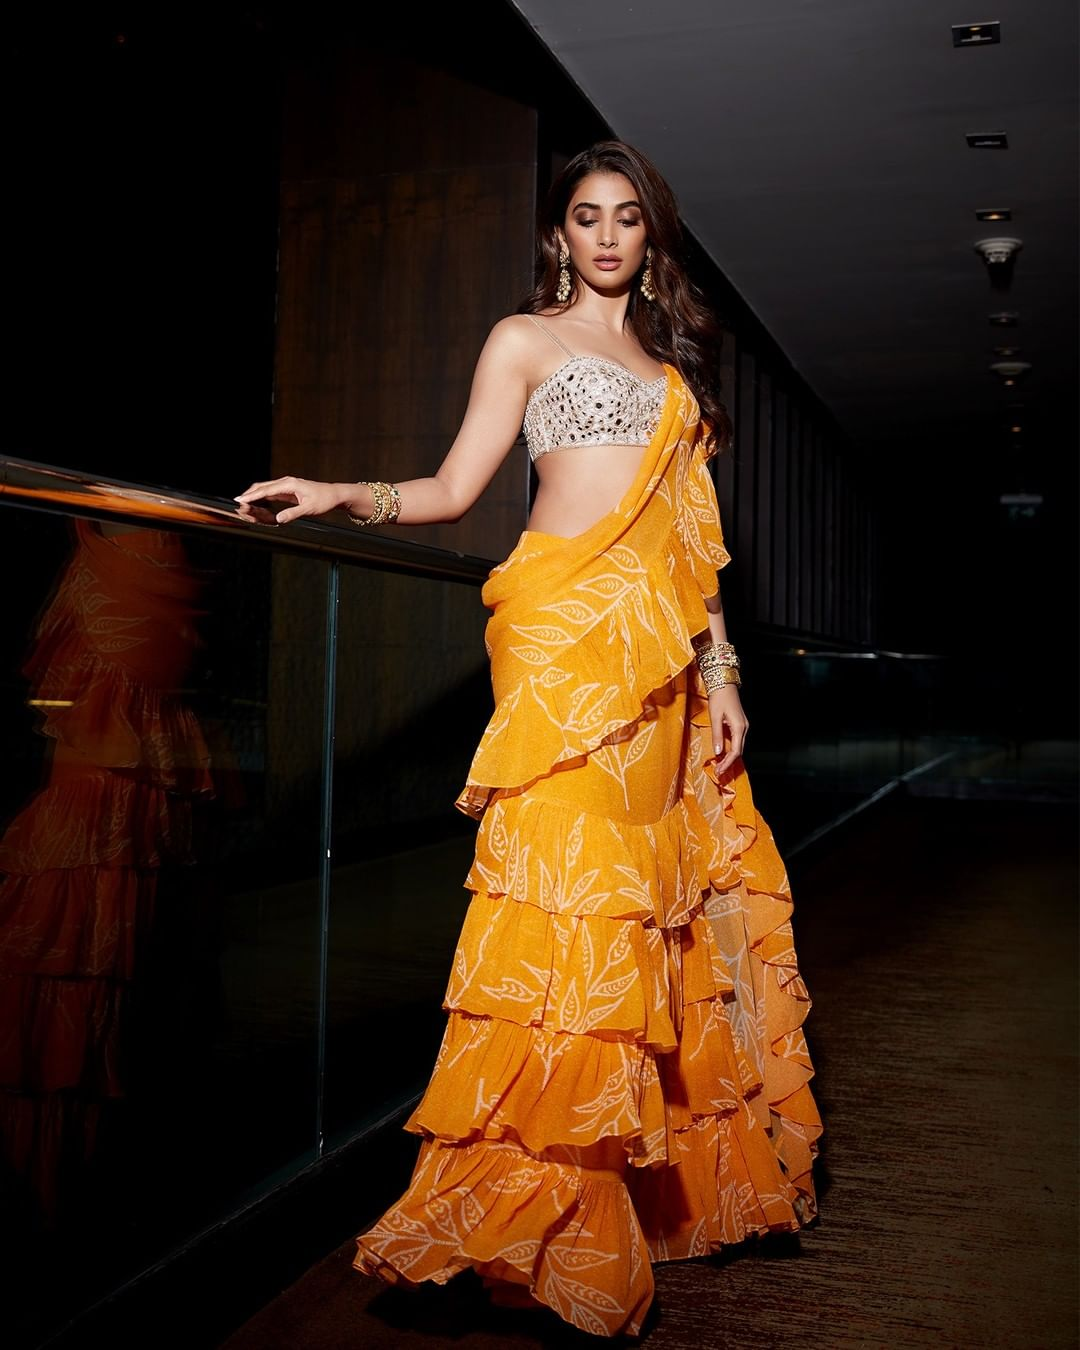 Turning heads in Poppy mango floral print ruffle sari set Pooja Hegde looks sensational at Siima Awards. 2021-09-21